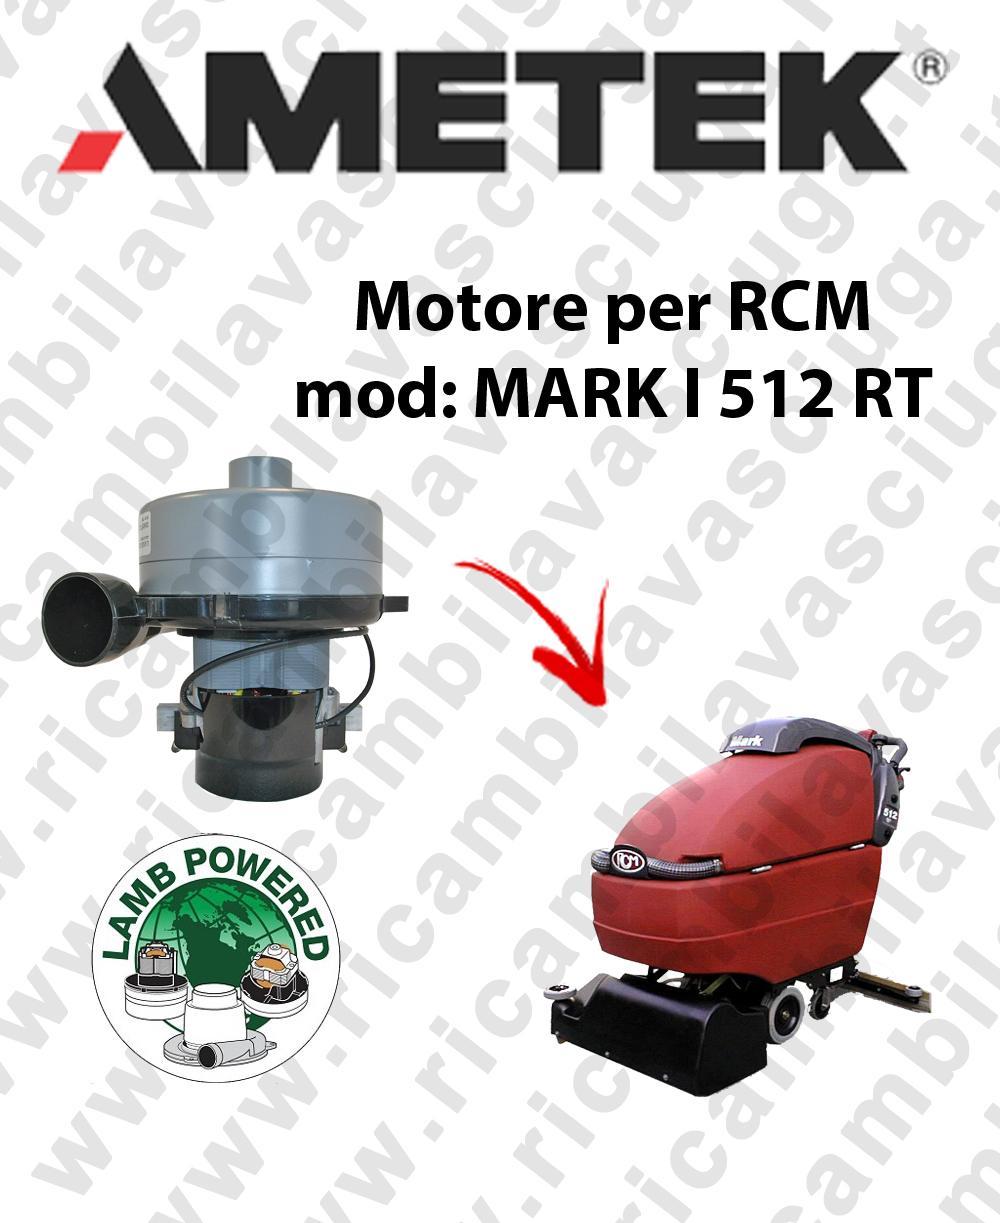 MARK I 512 RT MOTEUR ASPIRATION LAMB AMETEK autolaveuses RCM